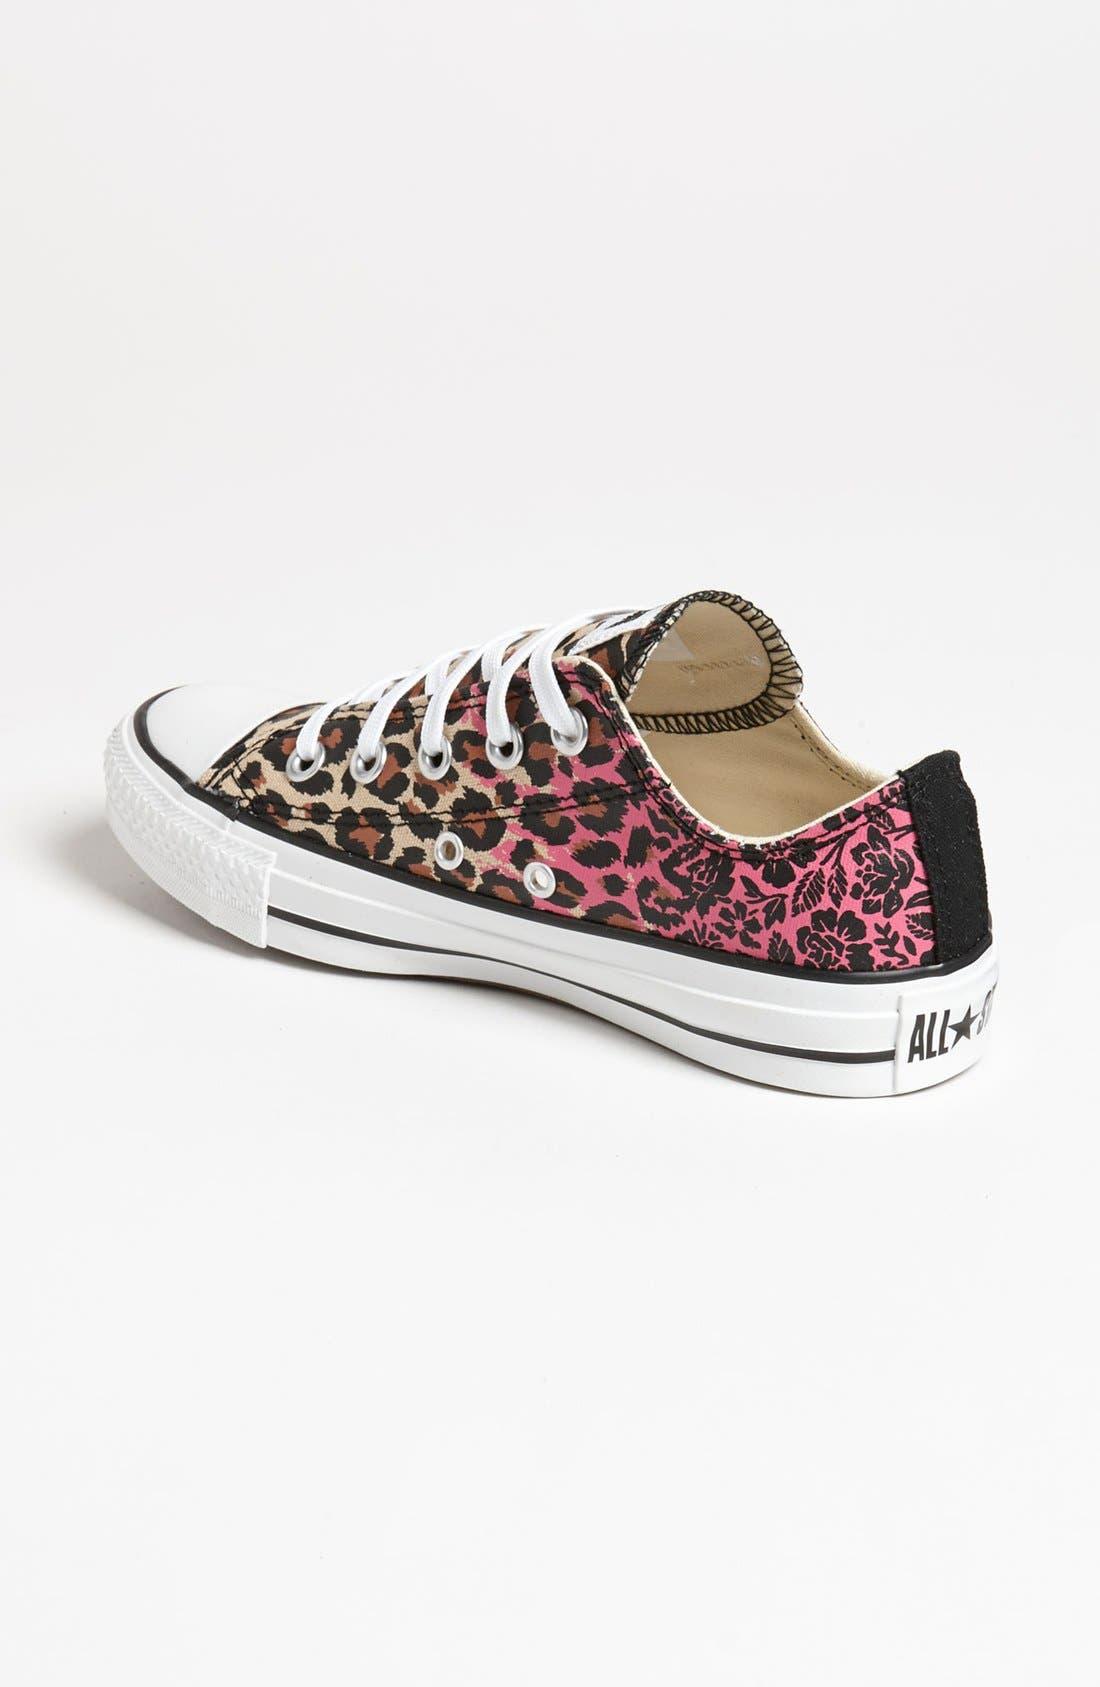 Alternate Image 2  - Converse Chuck Taylor® All Star® Animal Print Sneaker (Women)